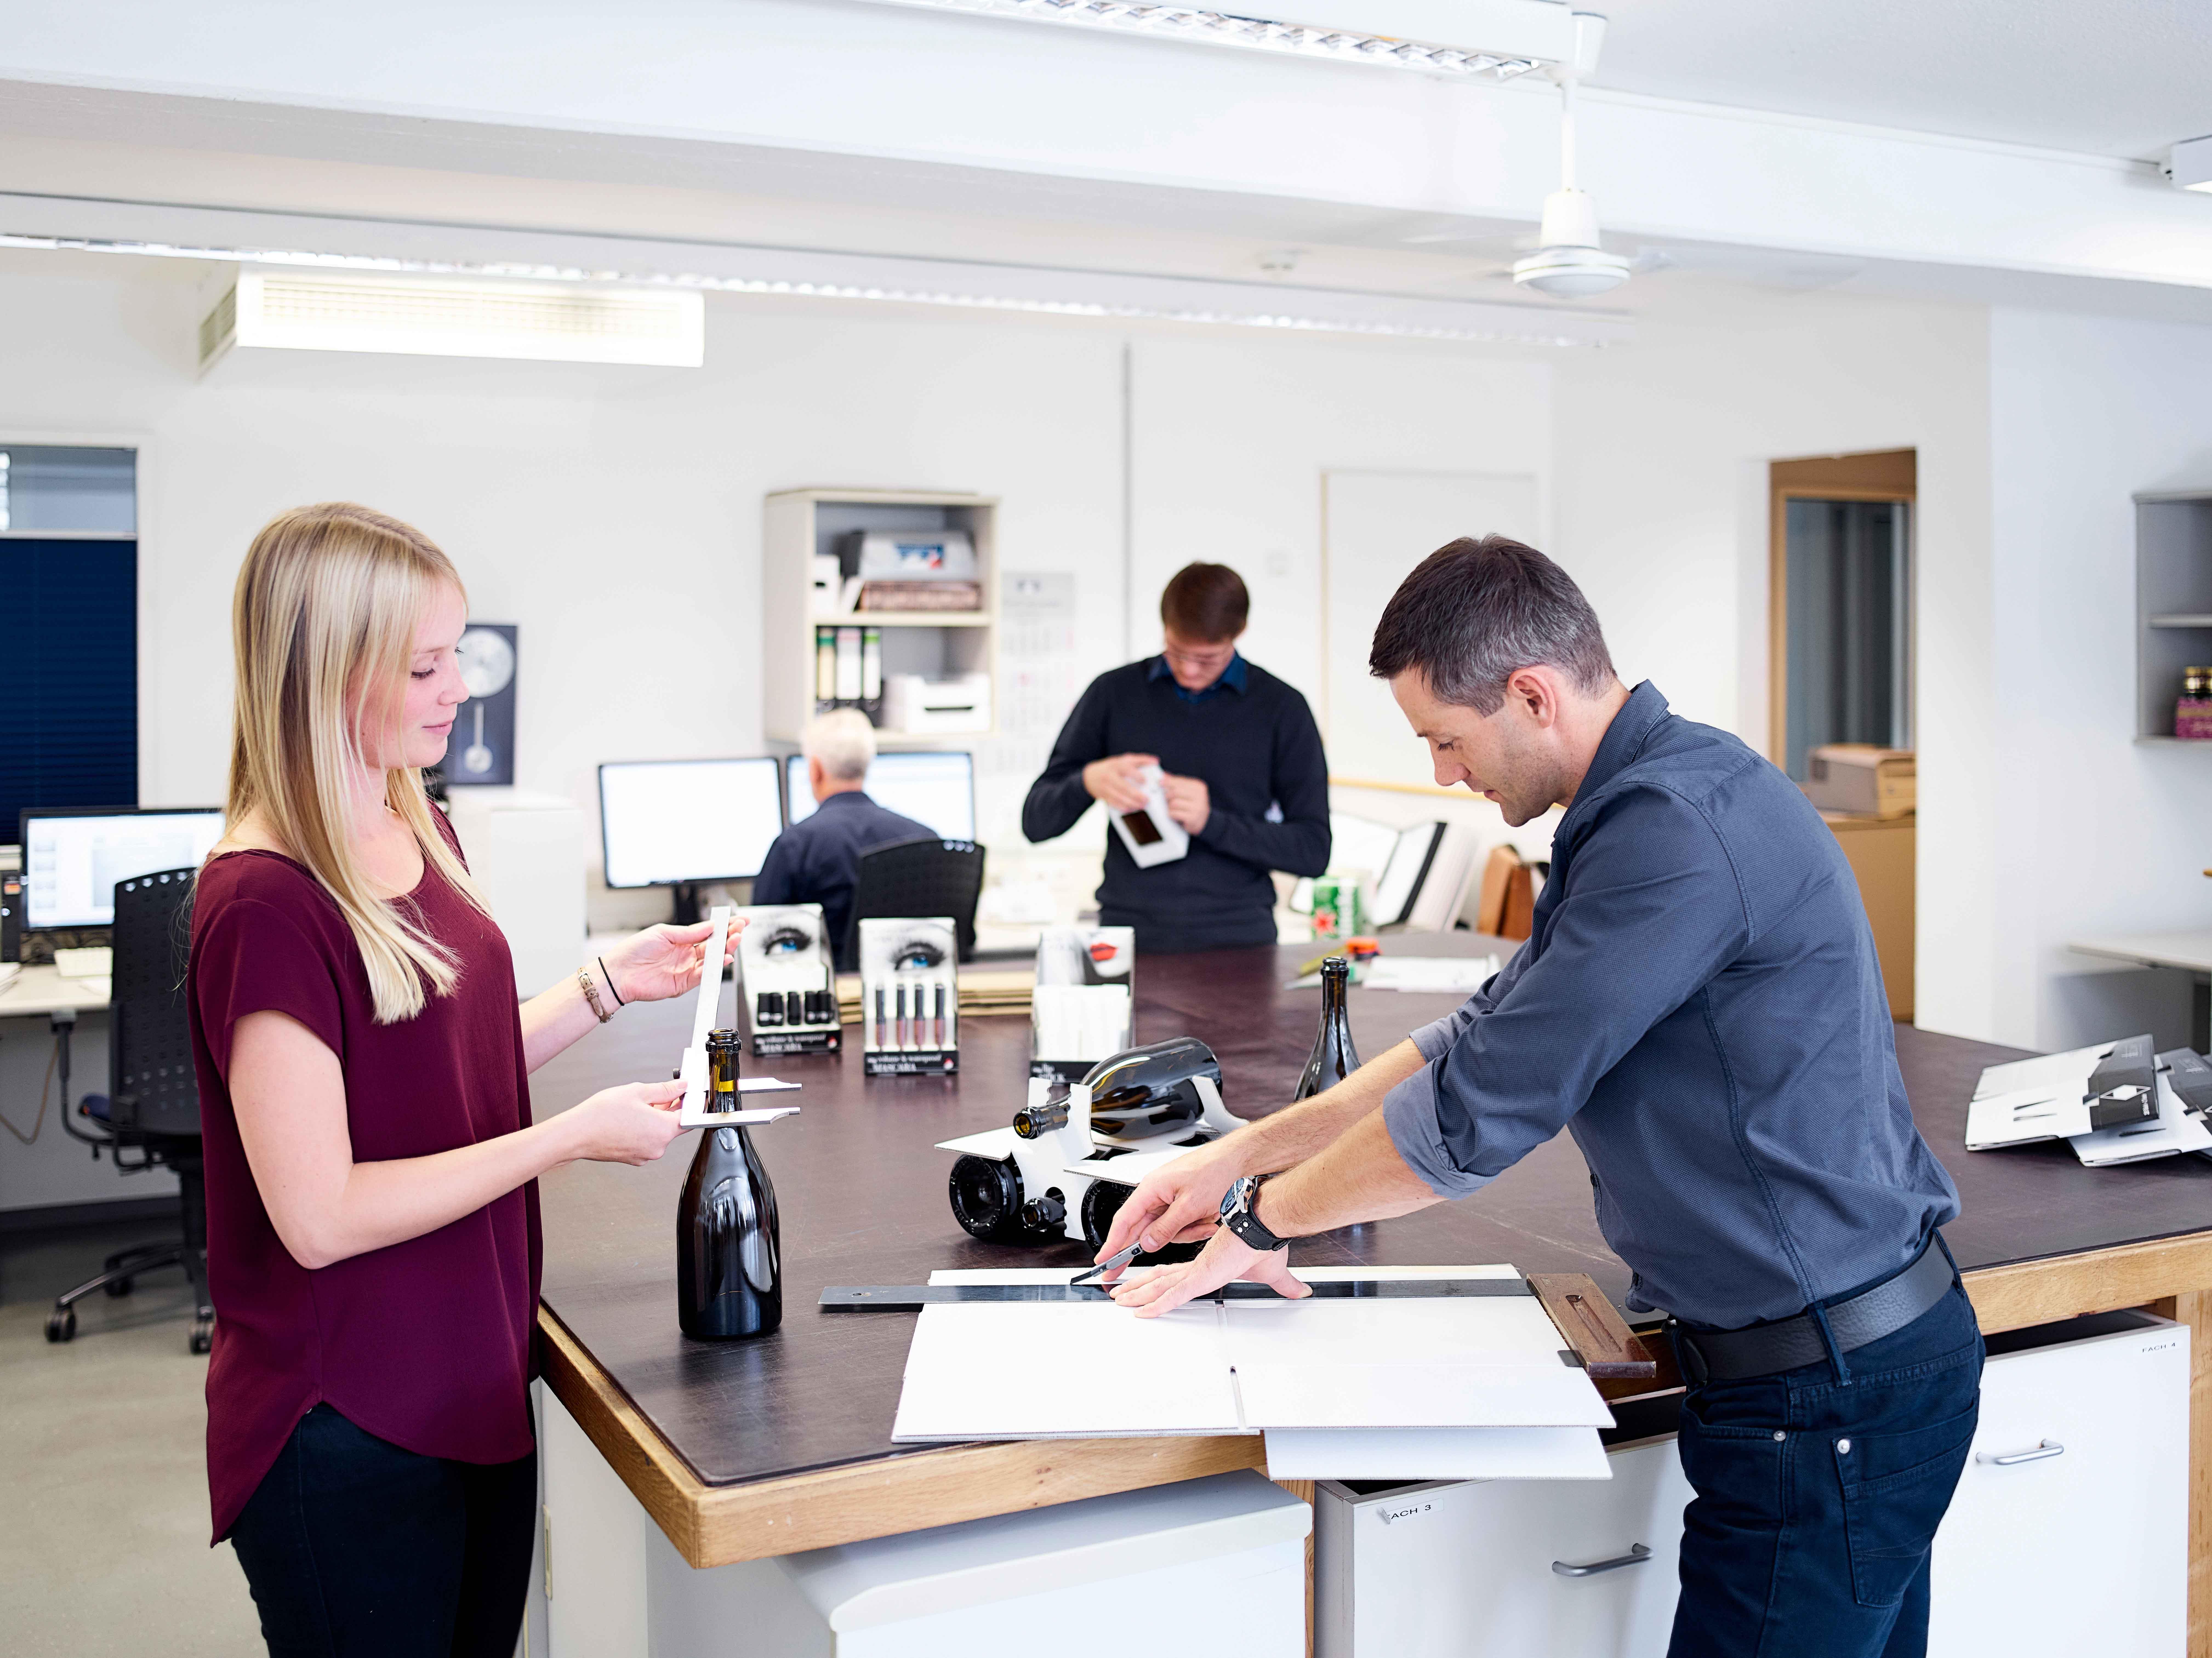 Brohl Wellpappe Mayen Entwicklung Design Ausbildung